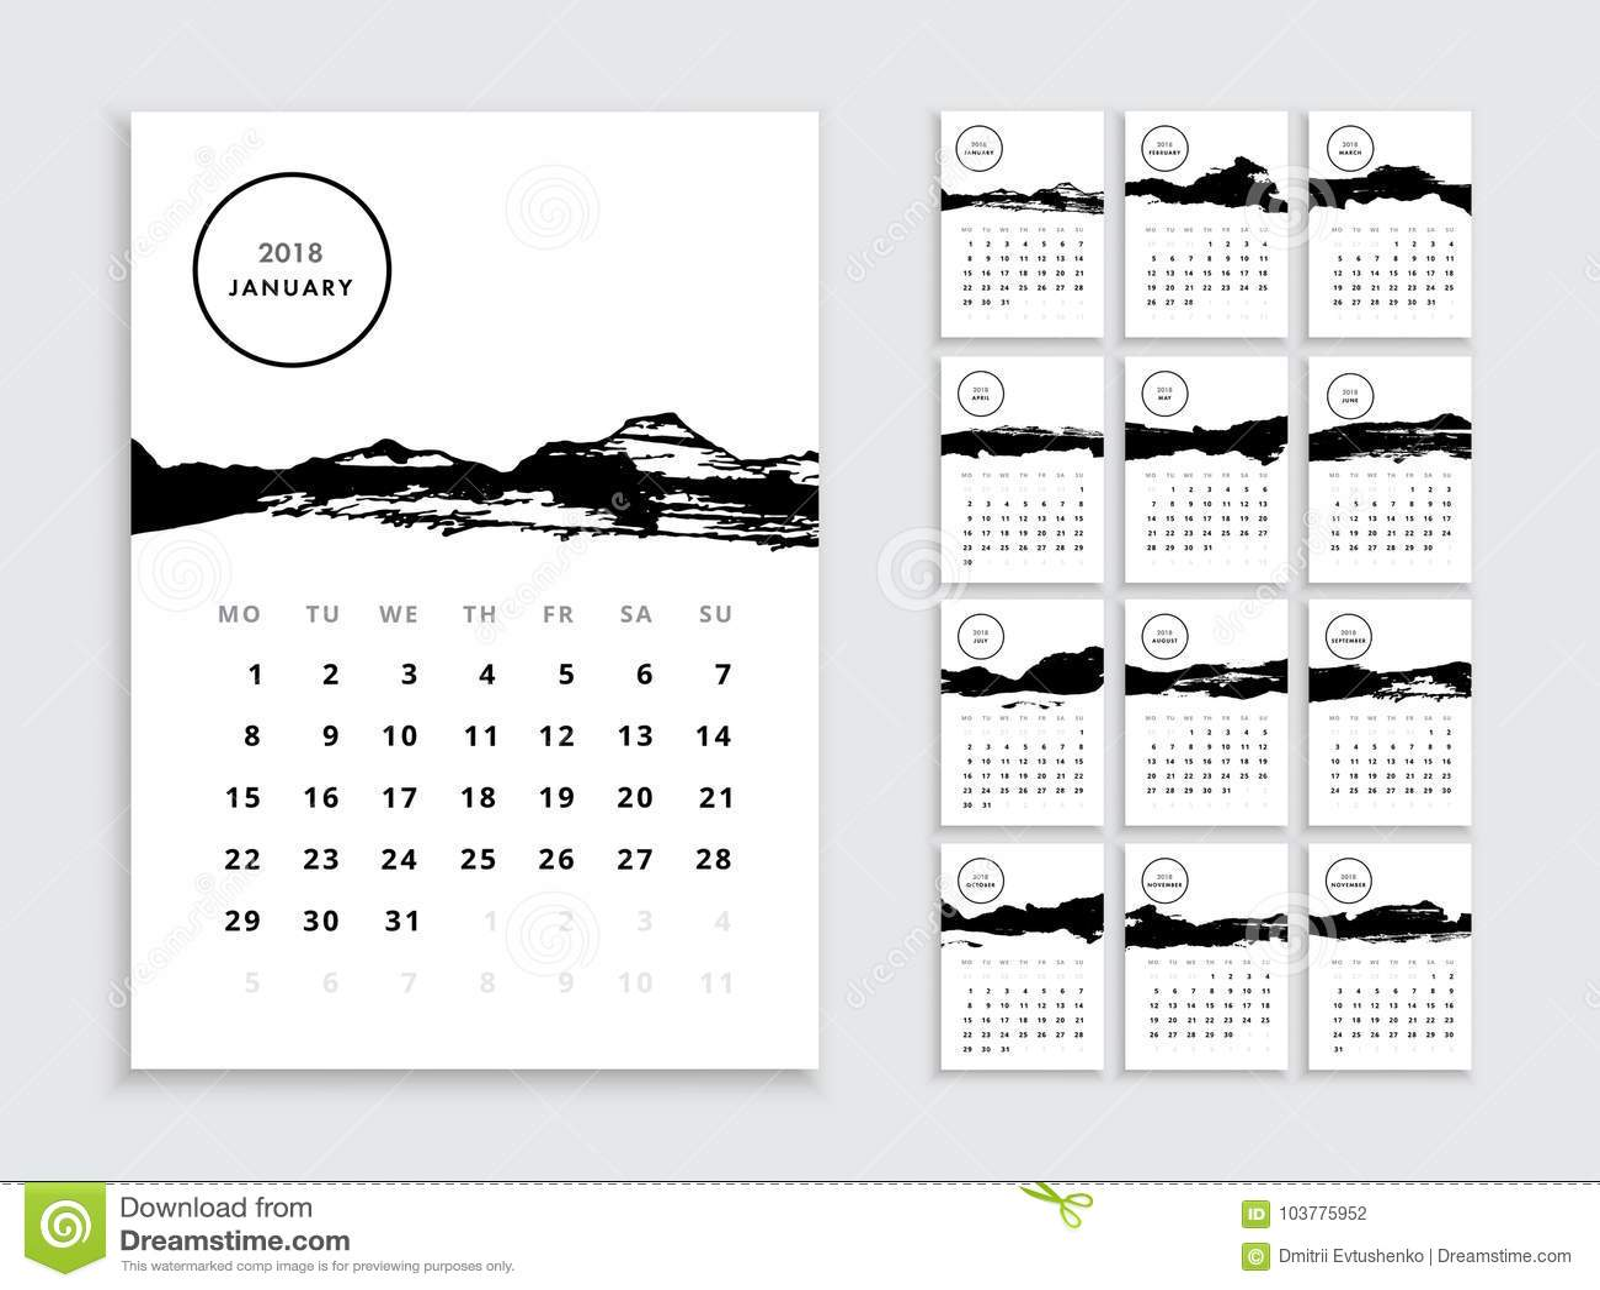 Calendar 2018 template stock vector illustration of monthly 103775952 download calendar 2018 template stock vector illustration of monthly 103775952 wajeb Images